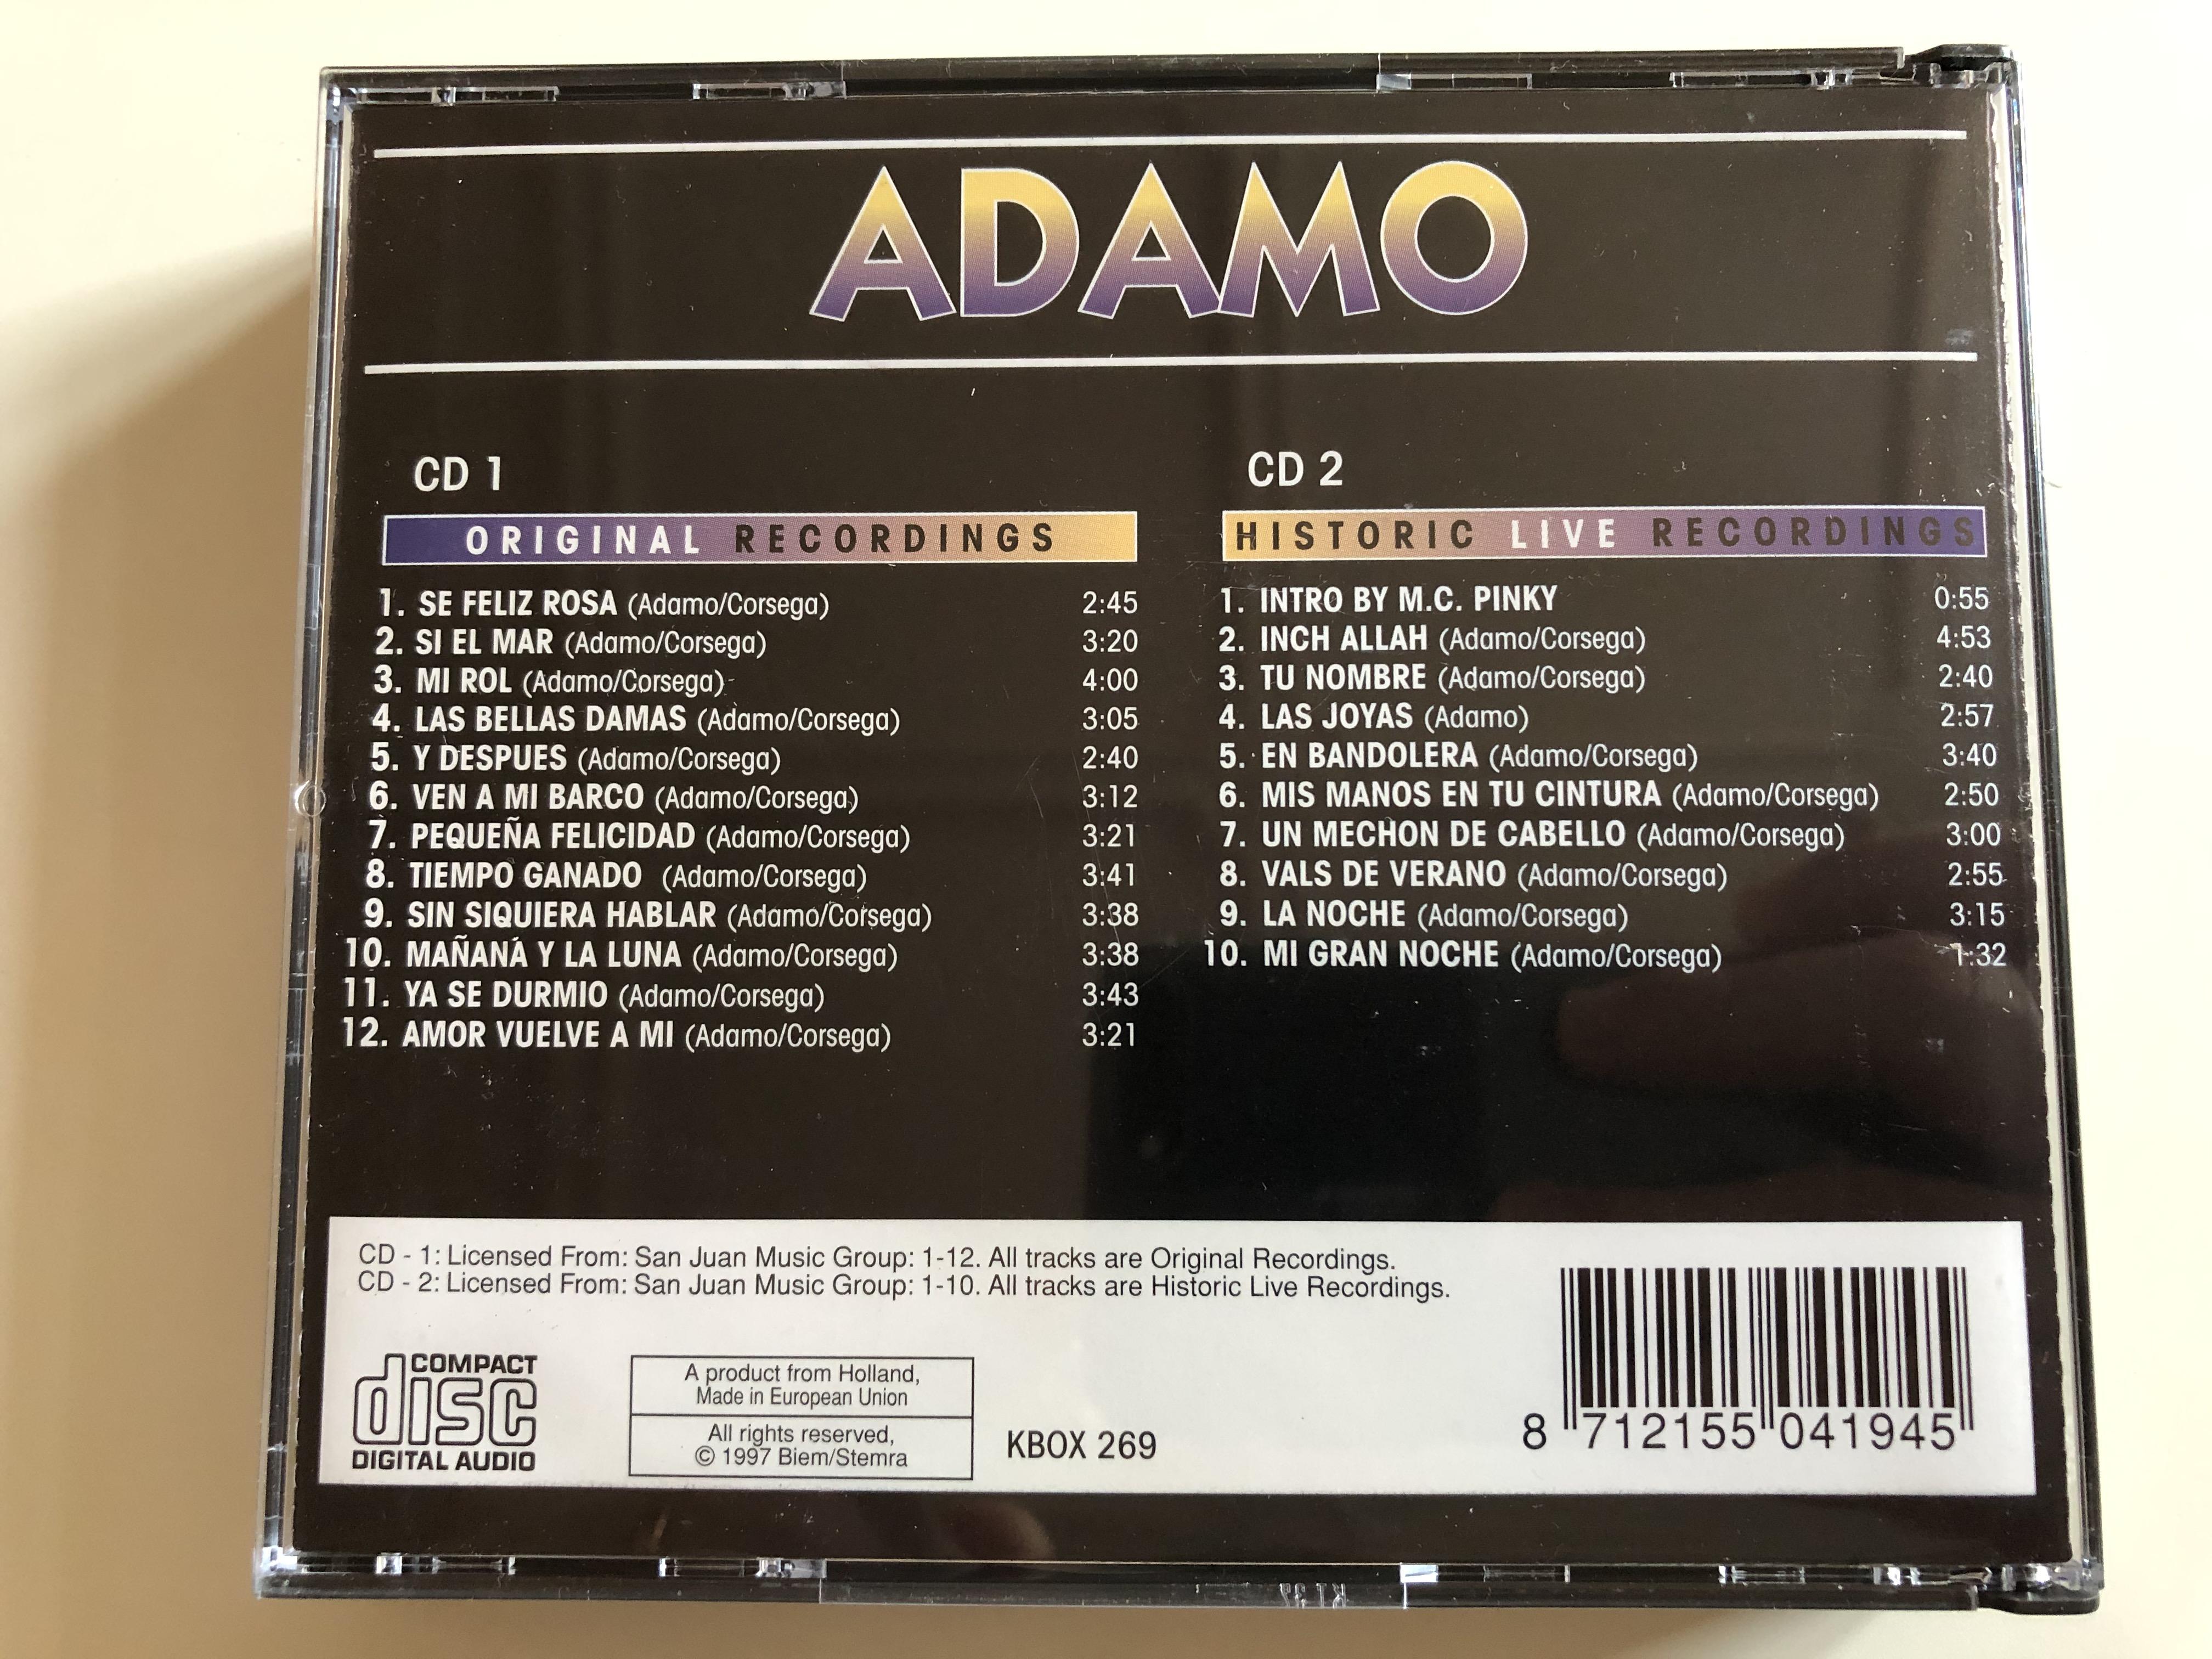 adamo-la-noche-las-joyas-tu-nombre-se-feliz-rosa-ya-se-durmio-sin-siquiera-hablar-biemstemra-2x-audio-cd-1997-kbox-269-4-.jpg